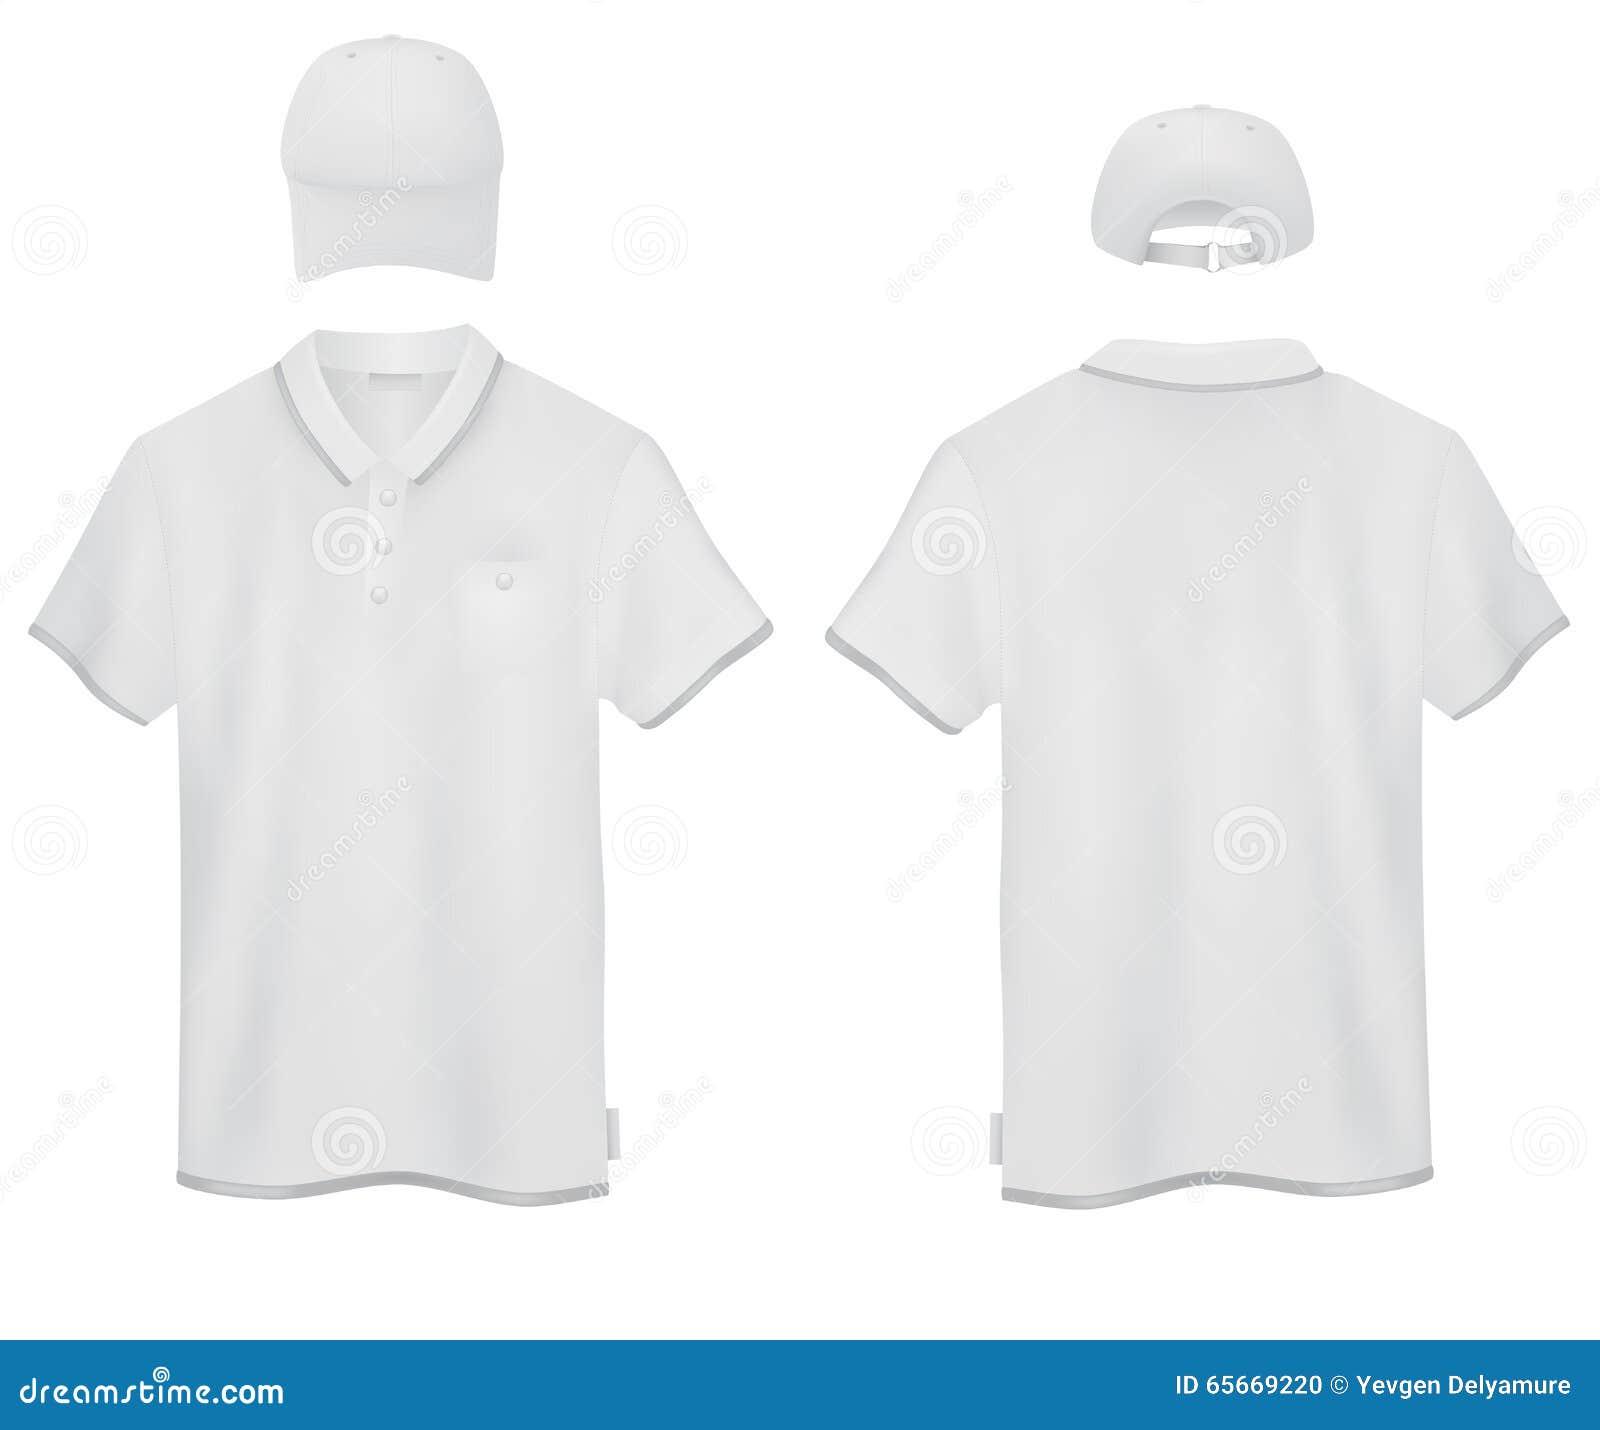 white polo and a baseball cap template stock vector illustration